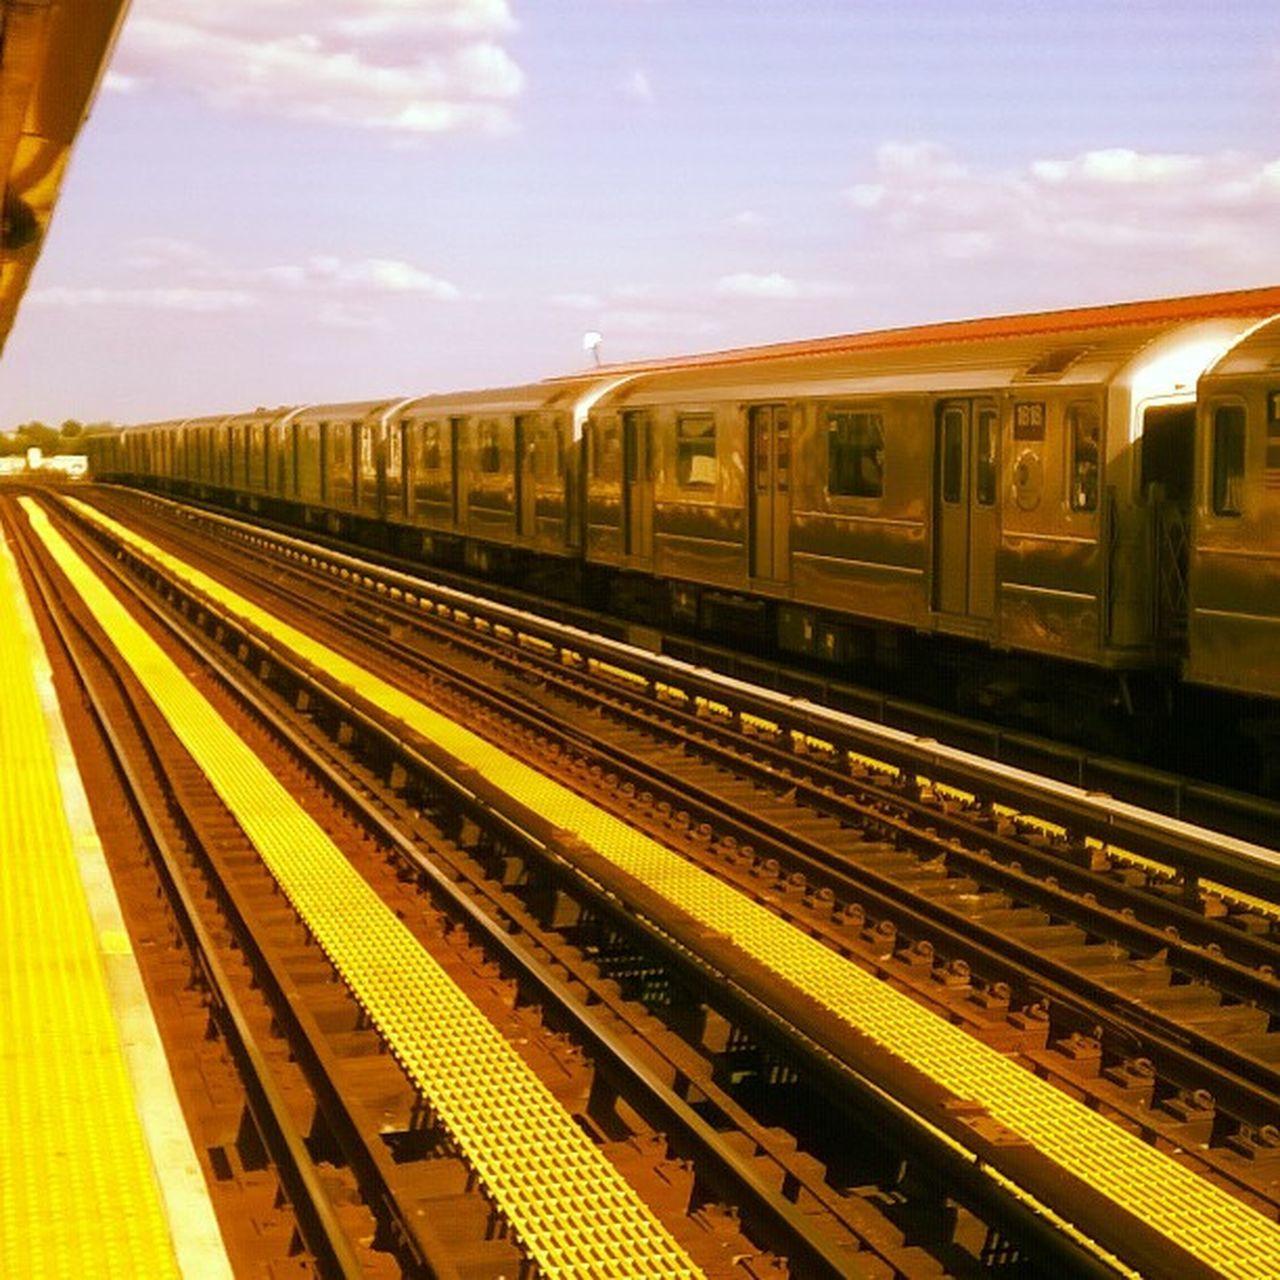 transportation, railroad station platform, train - vehicle, railroad track, public transportation, rail transportation, railroad station, station, journey, subway train, no people, sky, outdoors, day